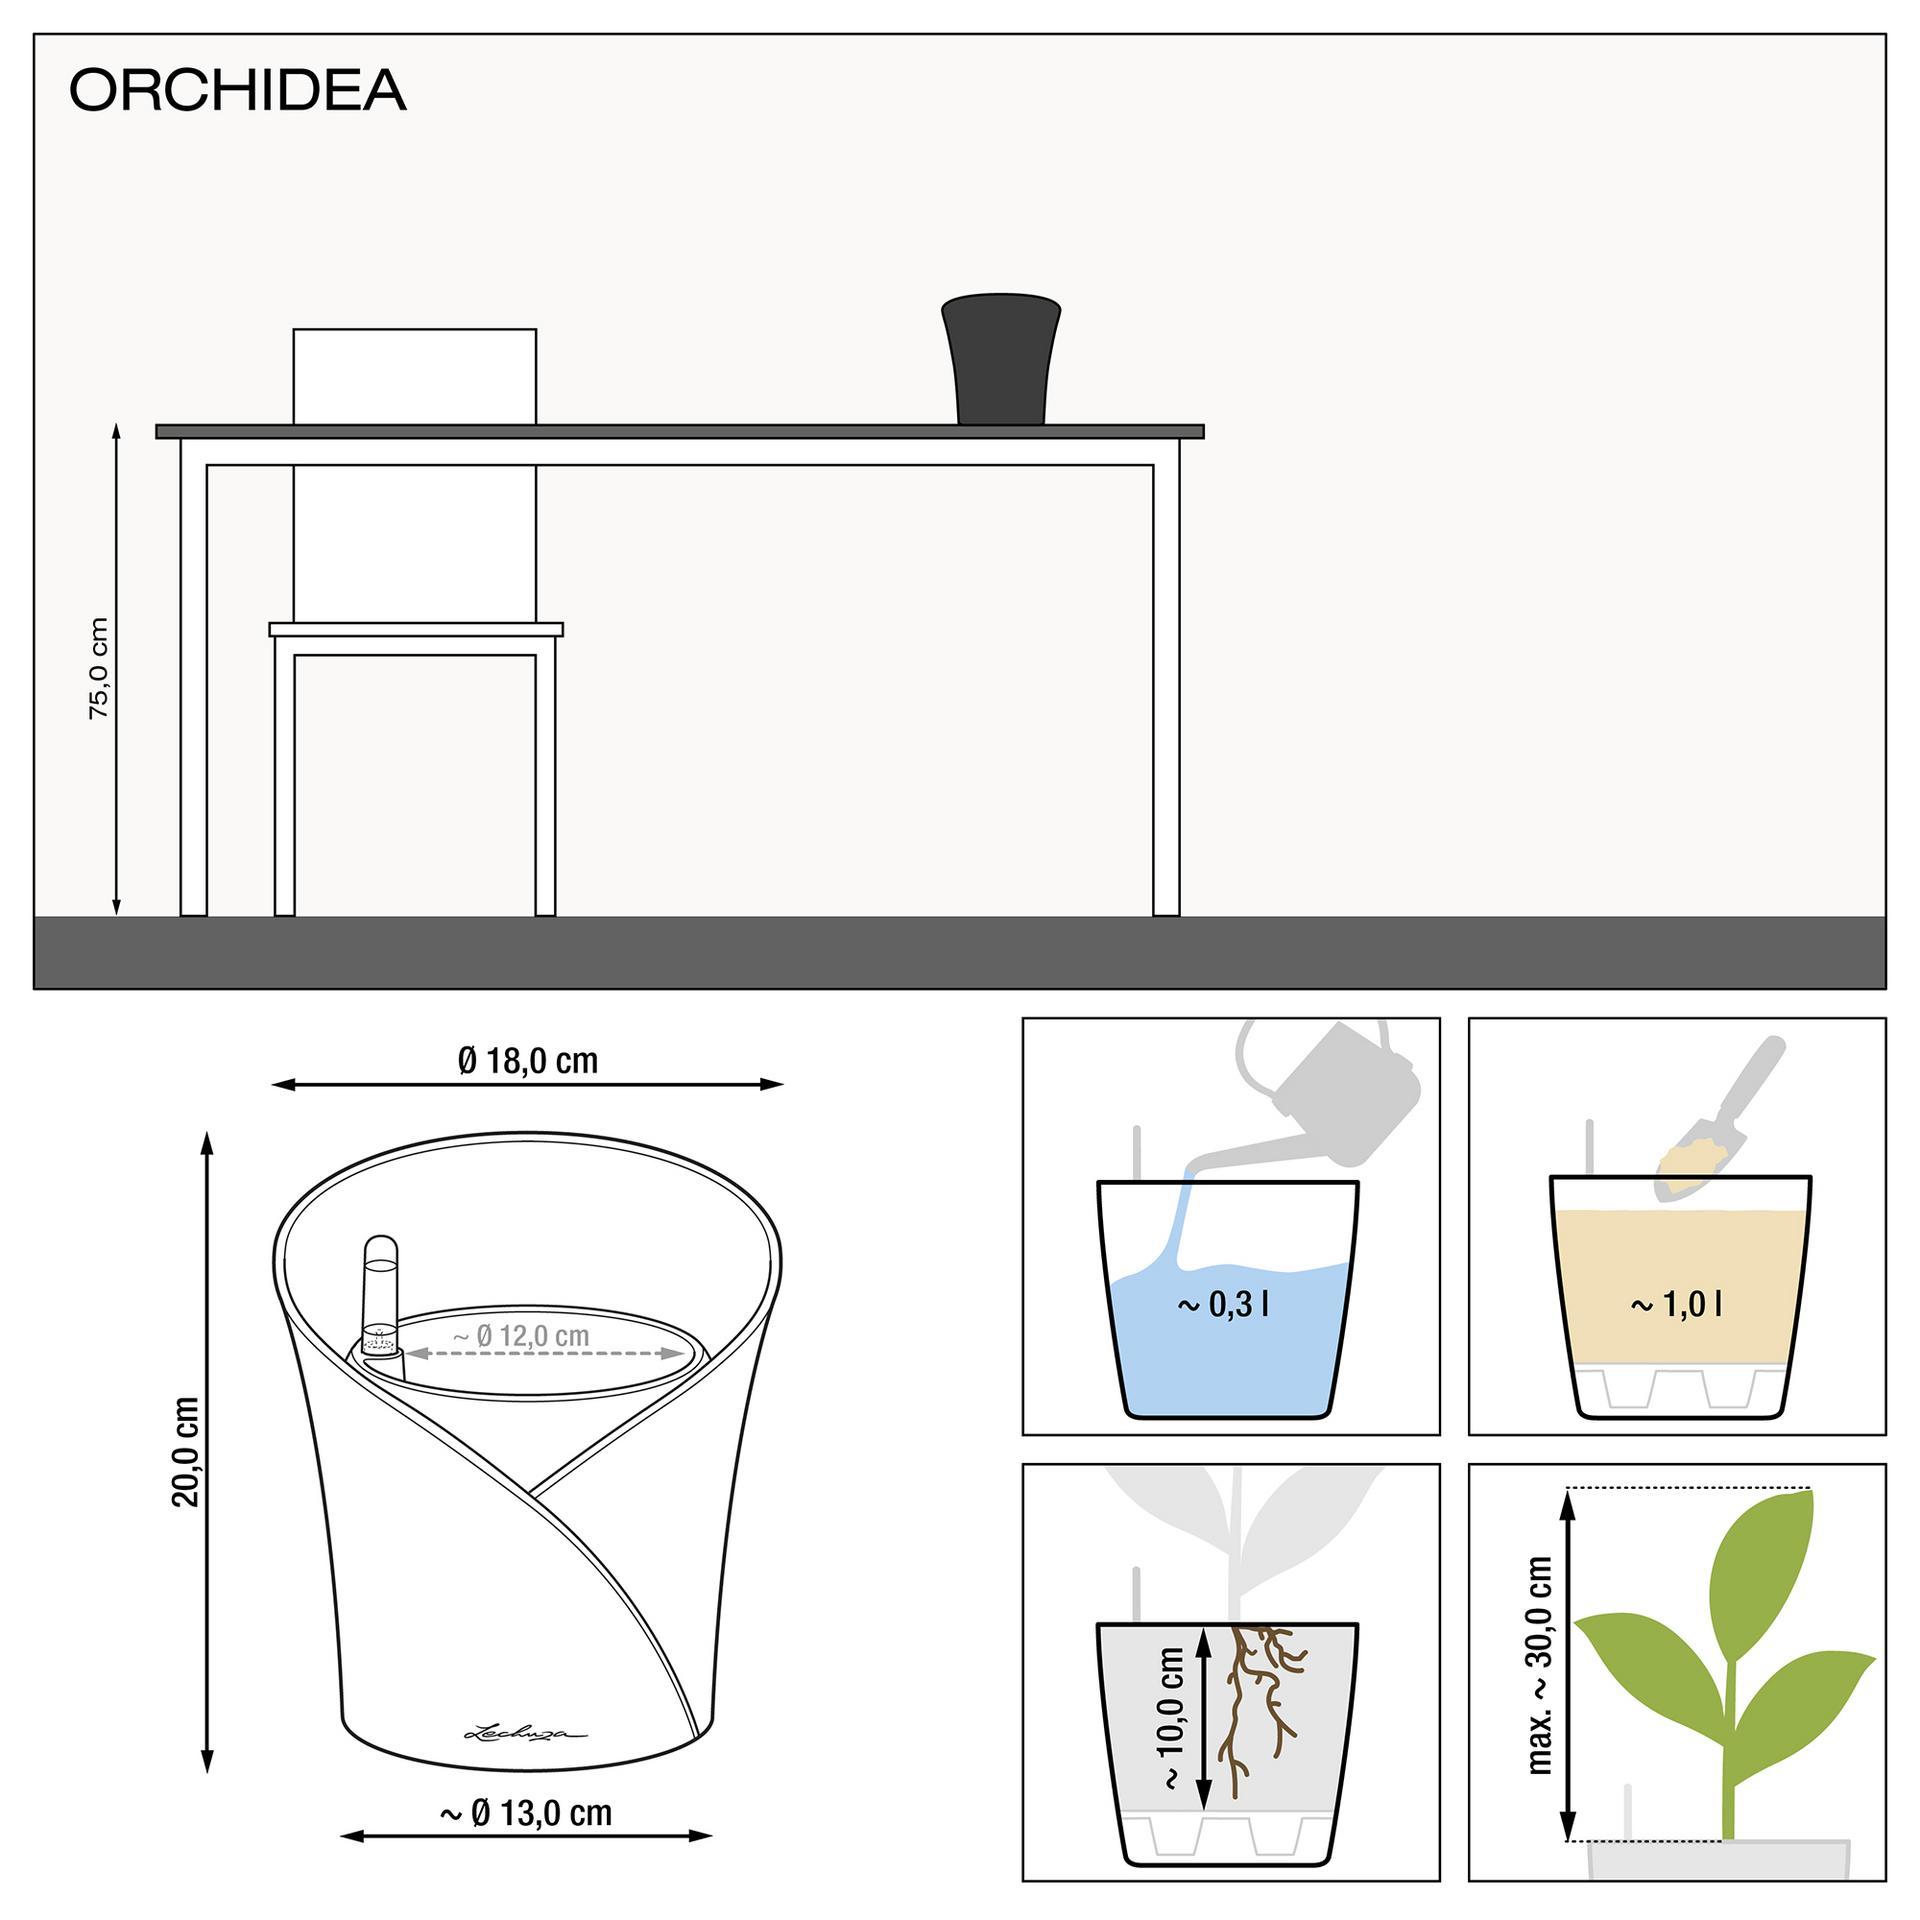 le_orchidea_product_addi_nz